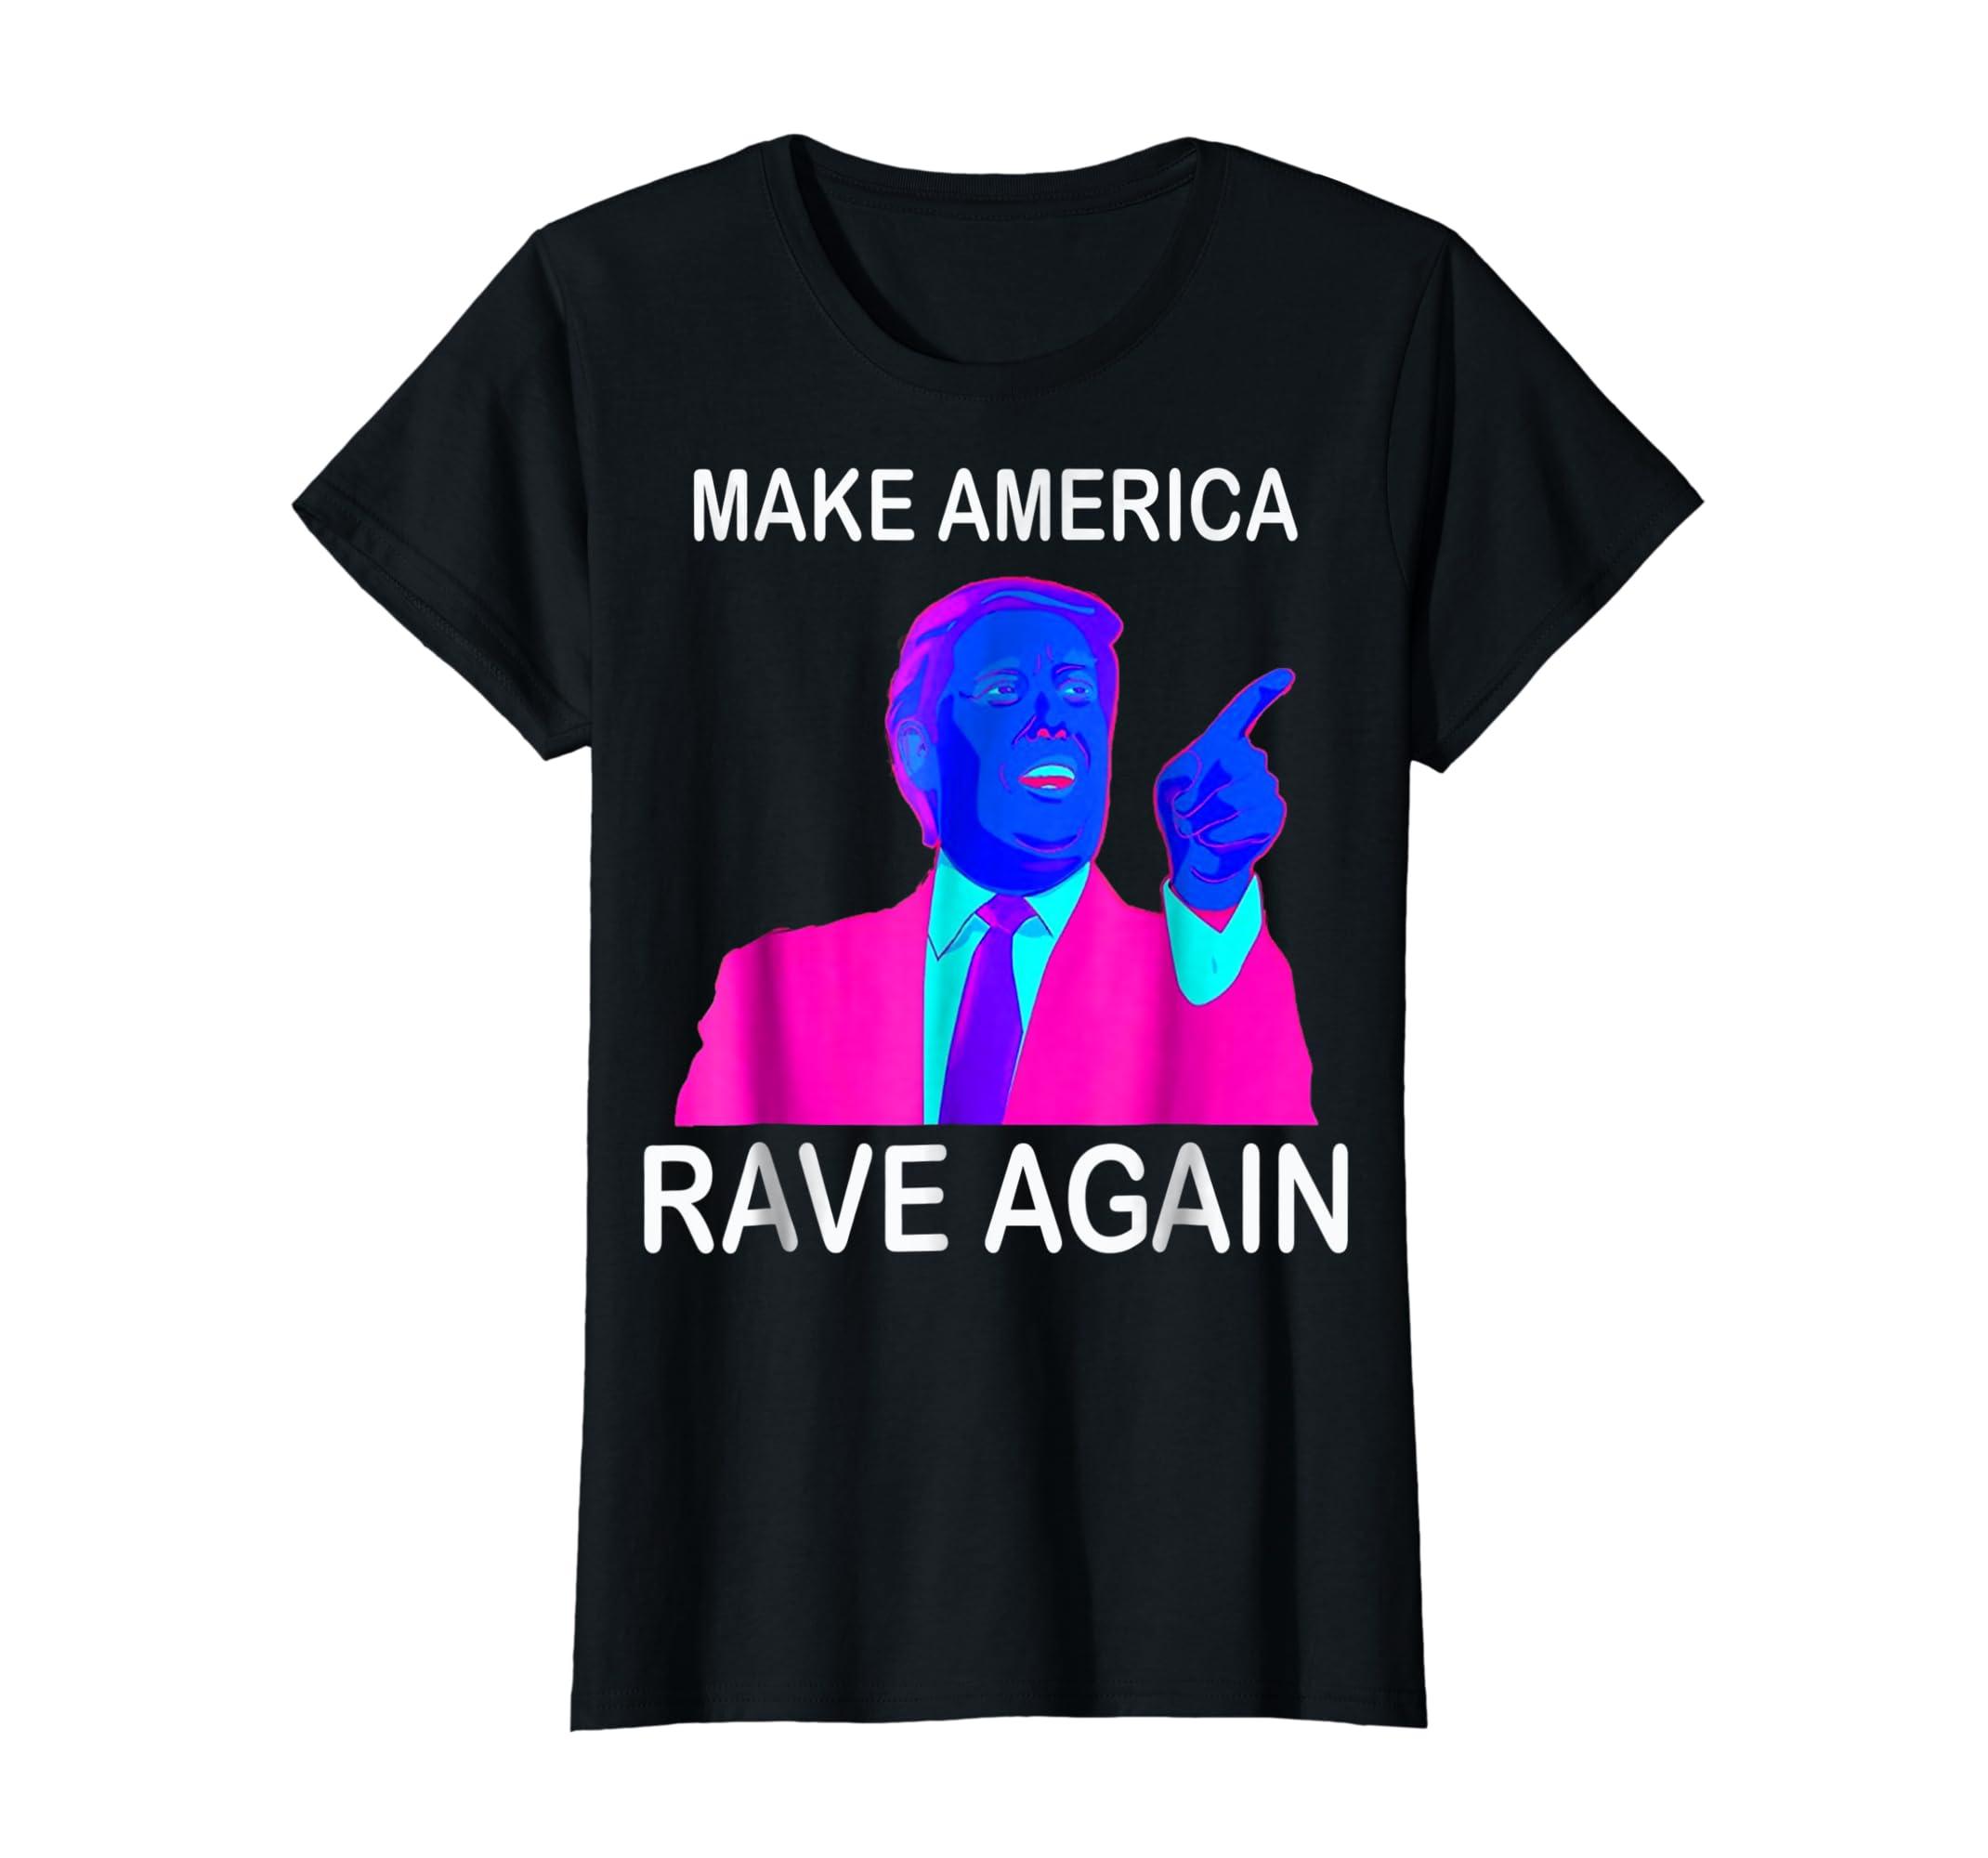 Make America Rave Again | Funny EDM Trump T-Shirt-Women's T-Shirt-Black